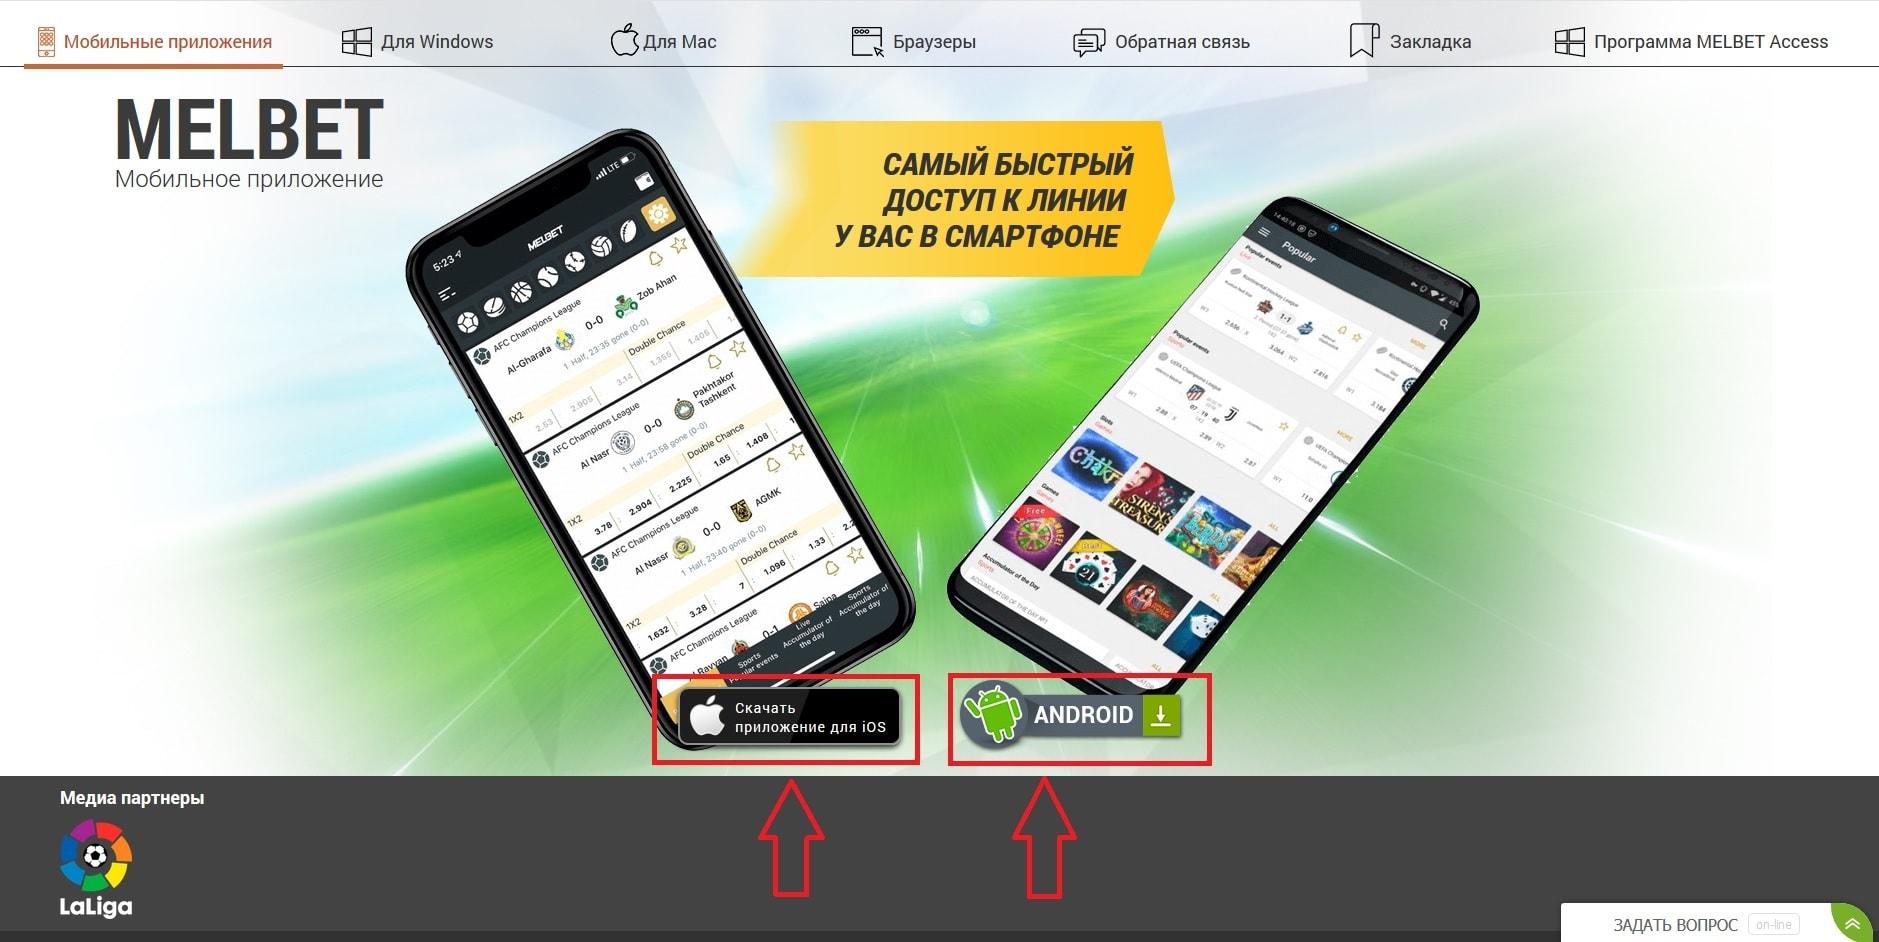 Приложения Андроид или iOS для ставок на спорт